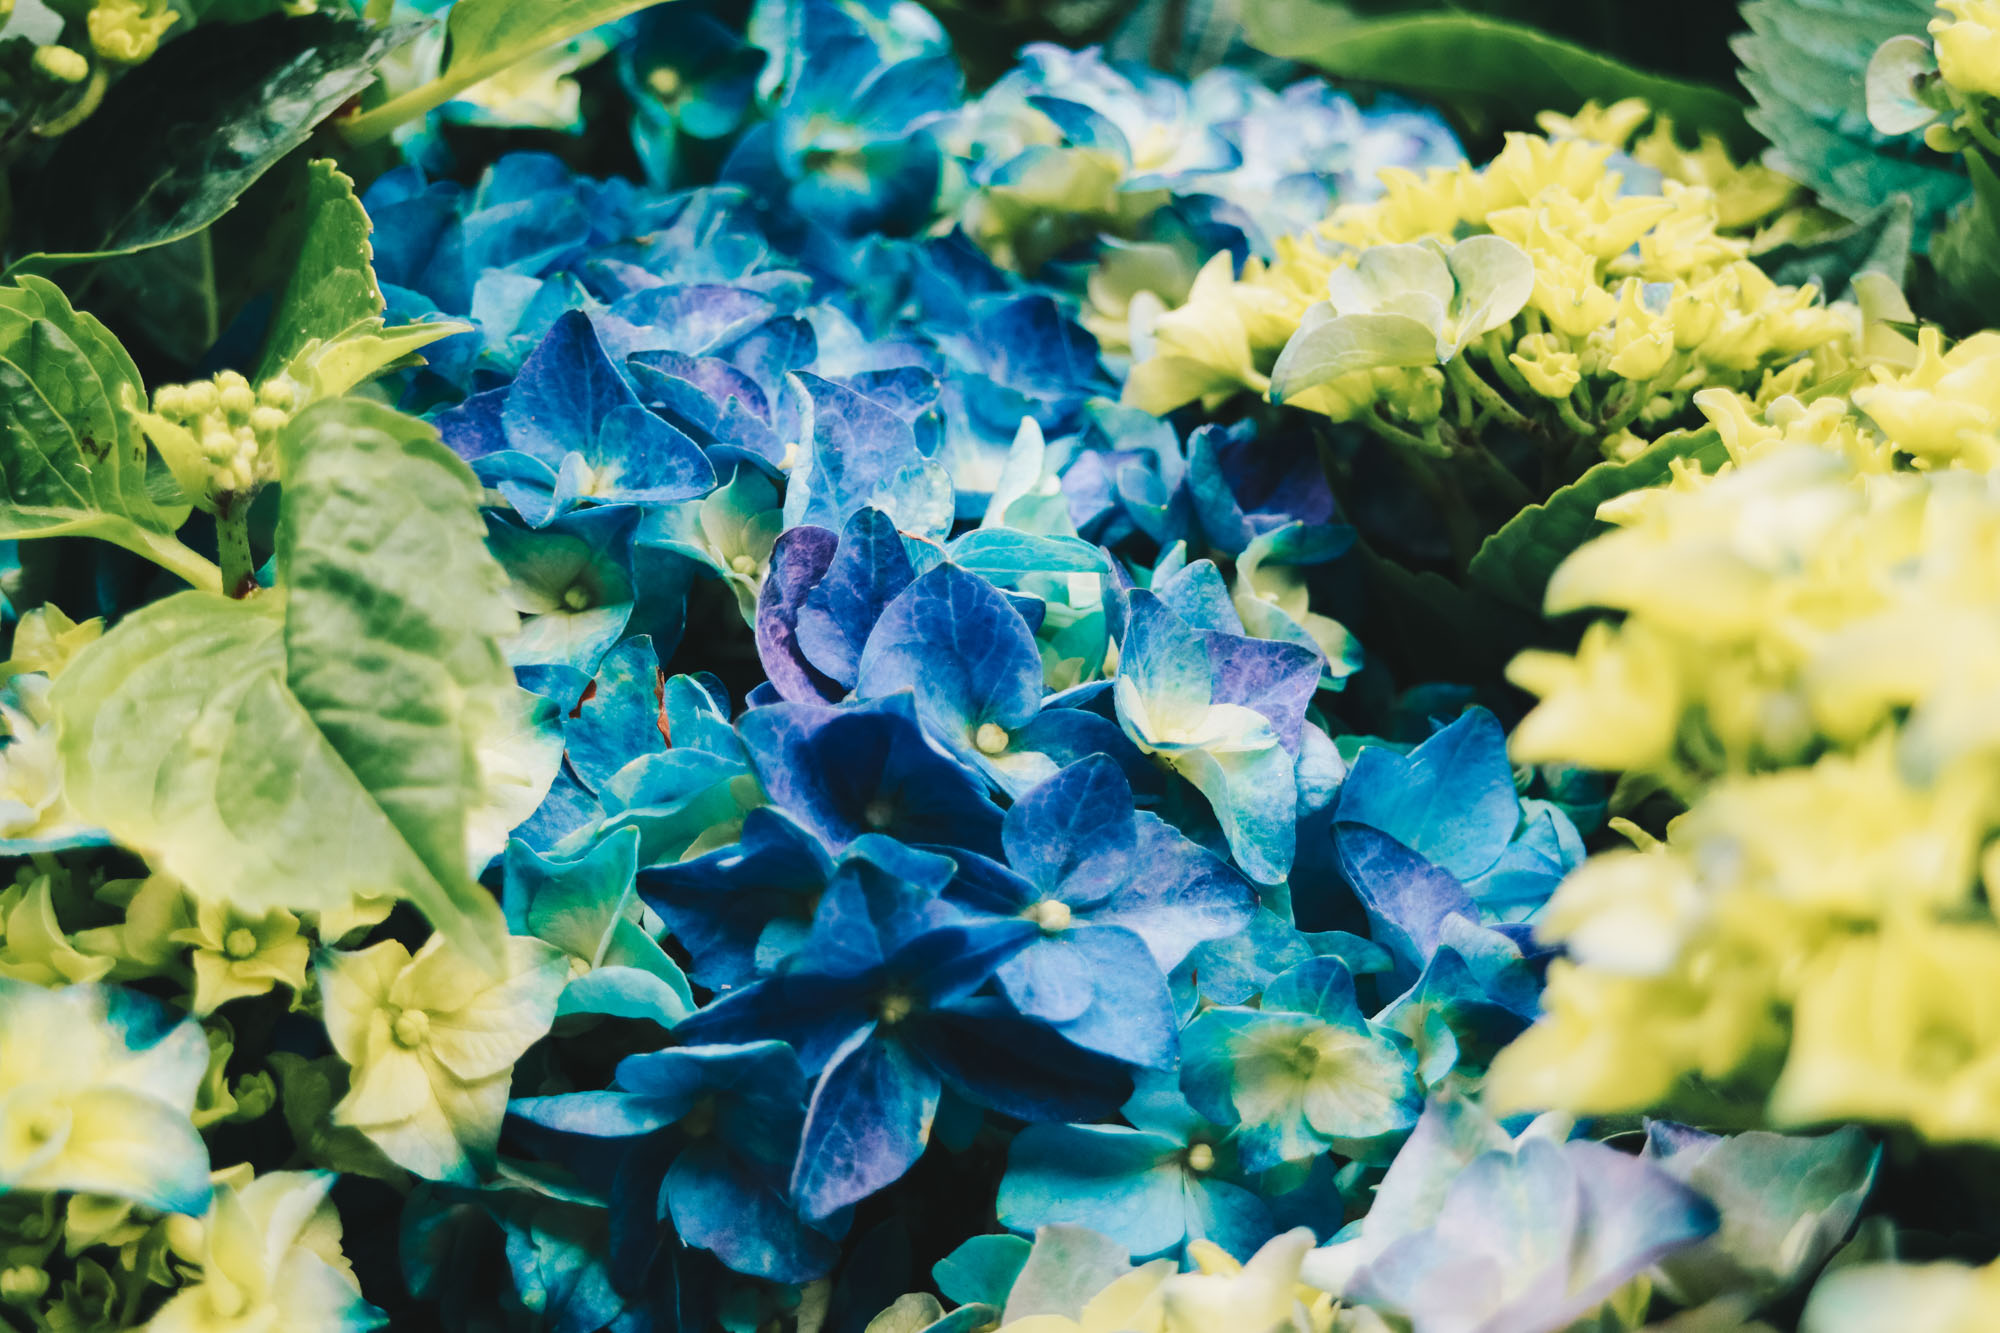 Blue-beauties-floral-display-gardensbythebay-darrenbloggie2